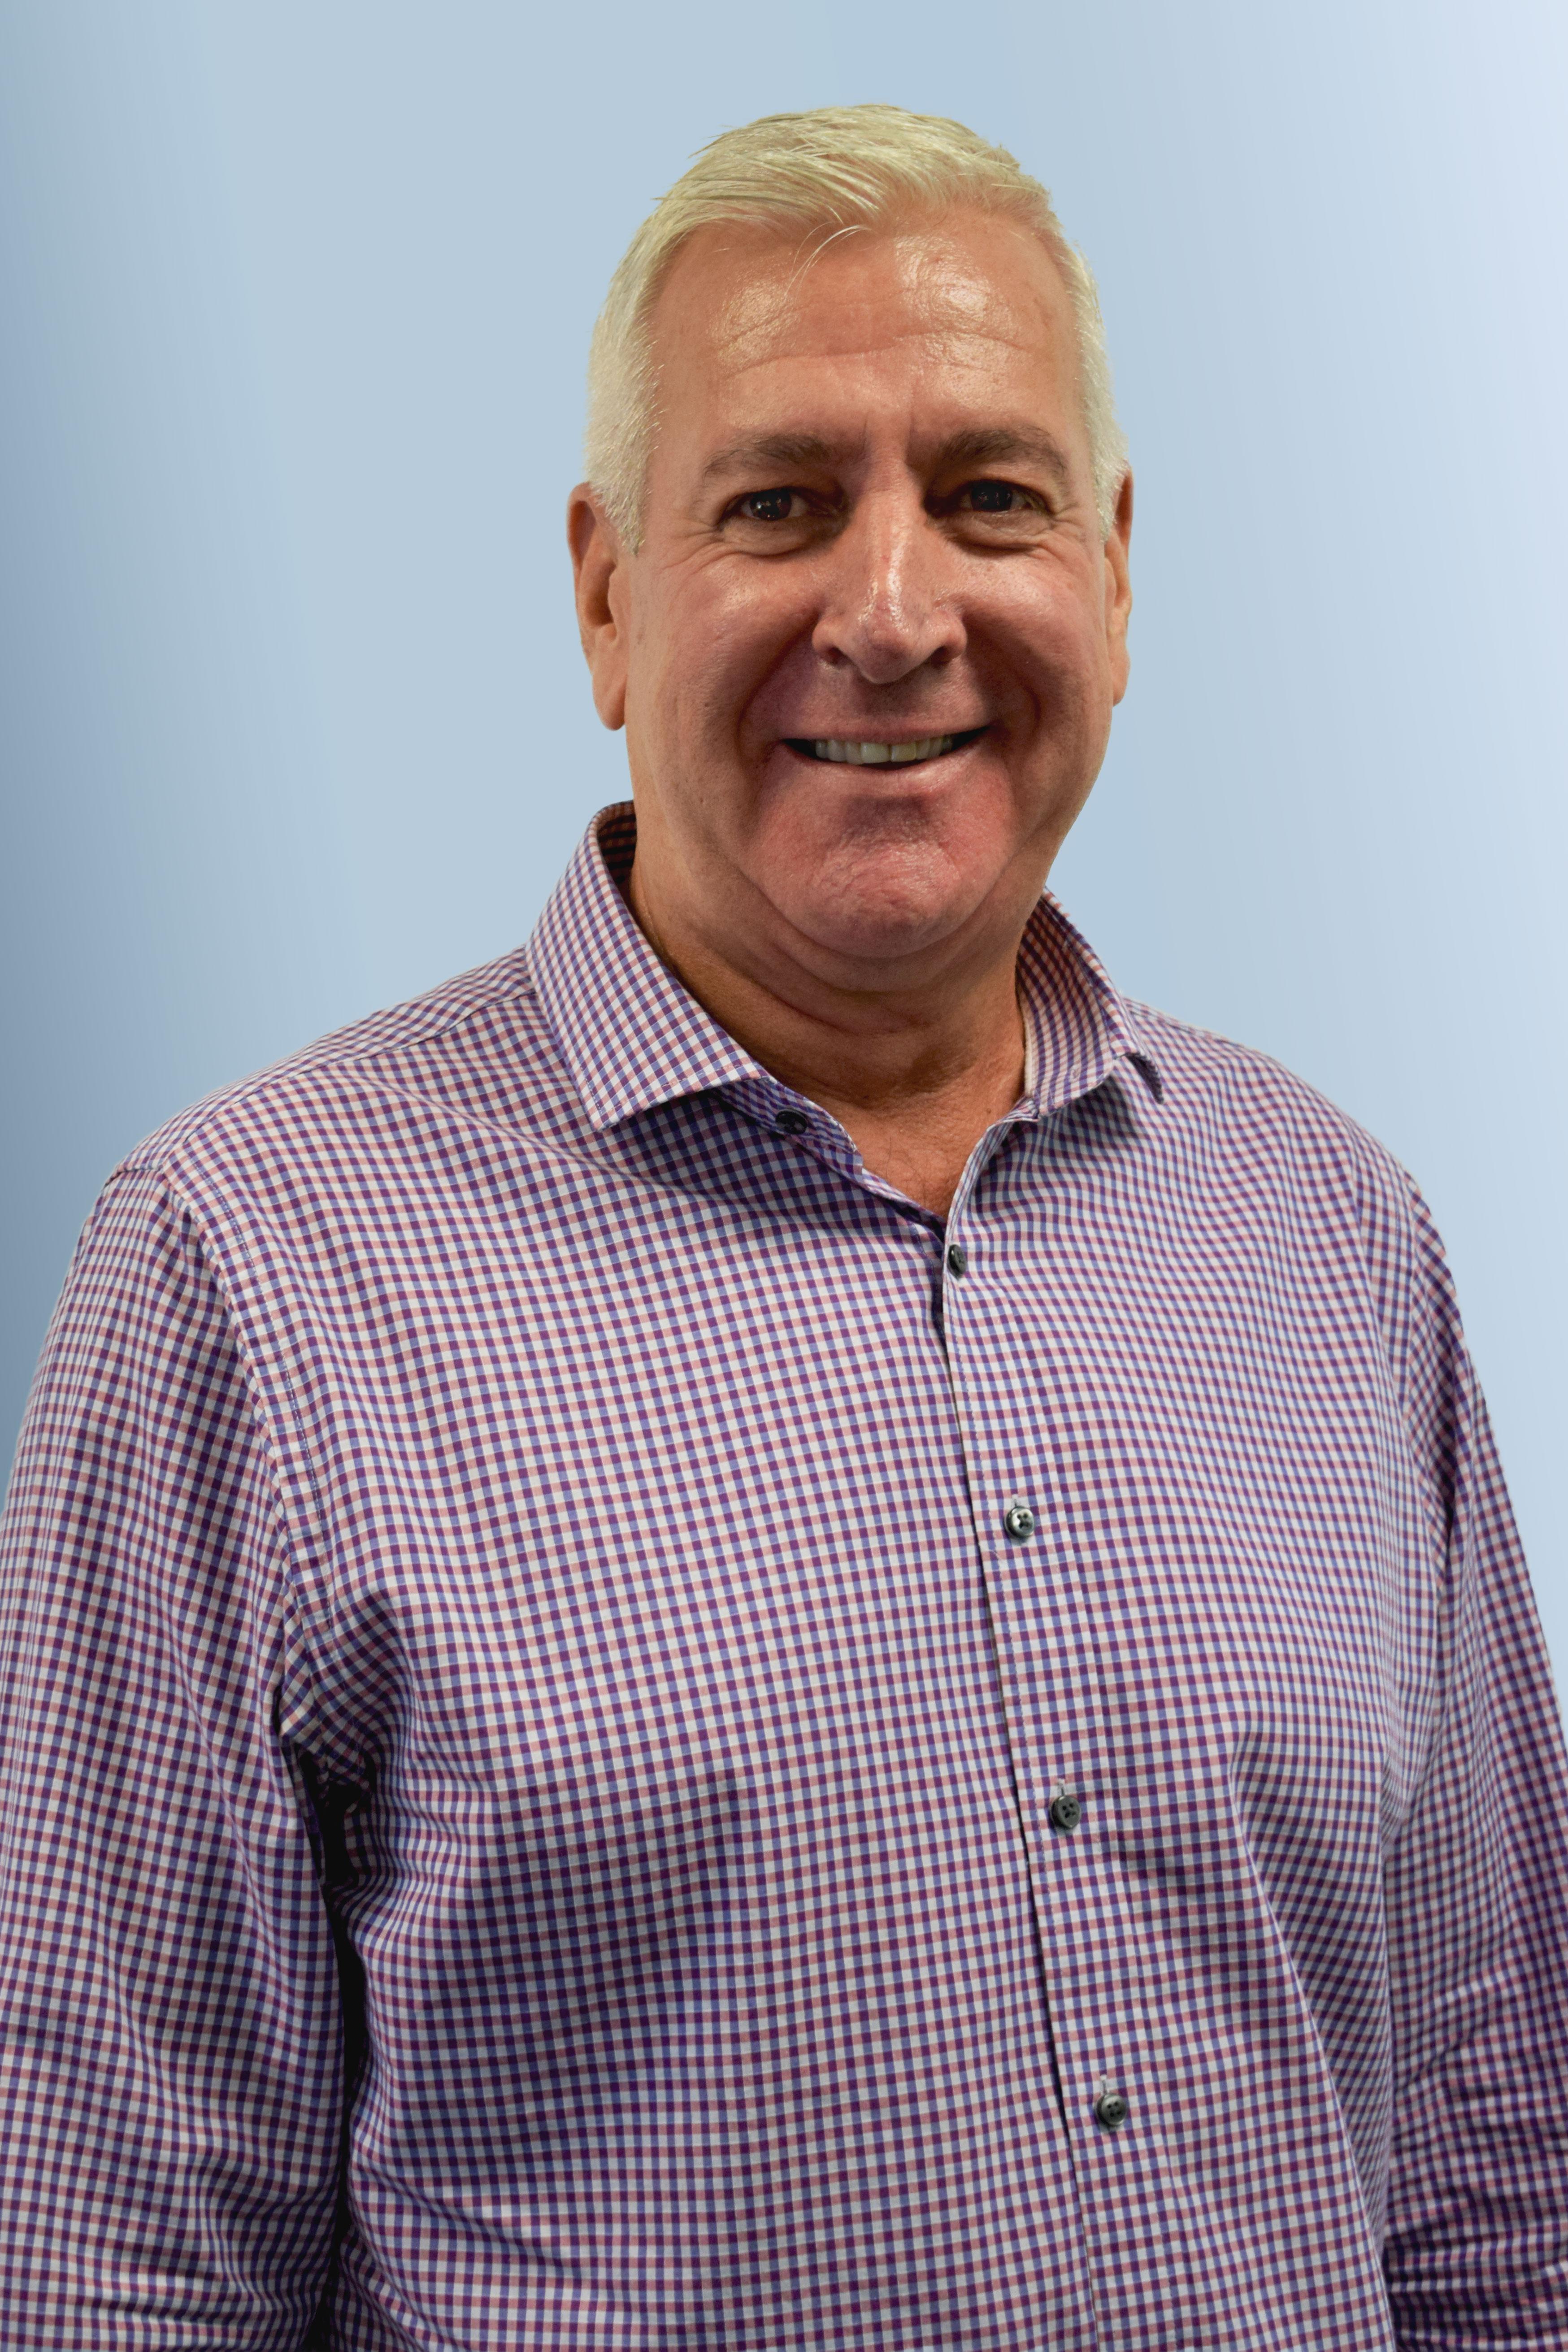 Geoff Hester